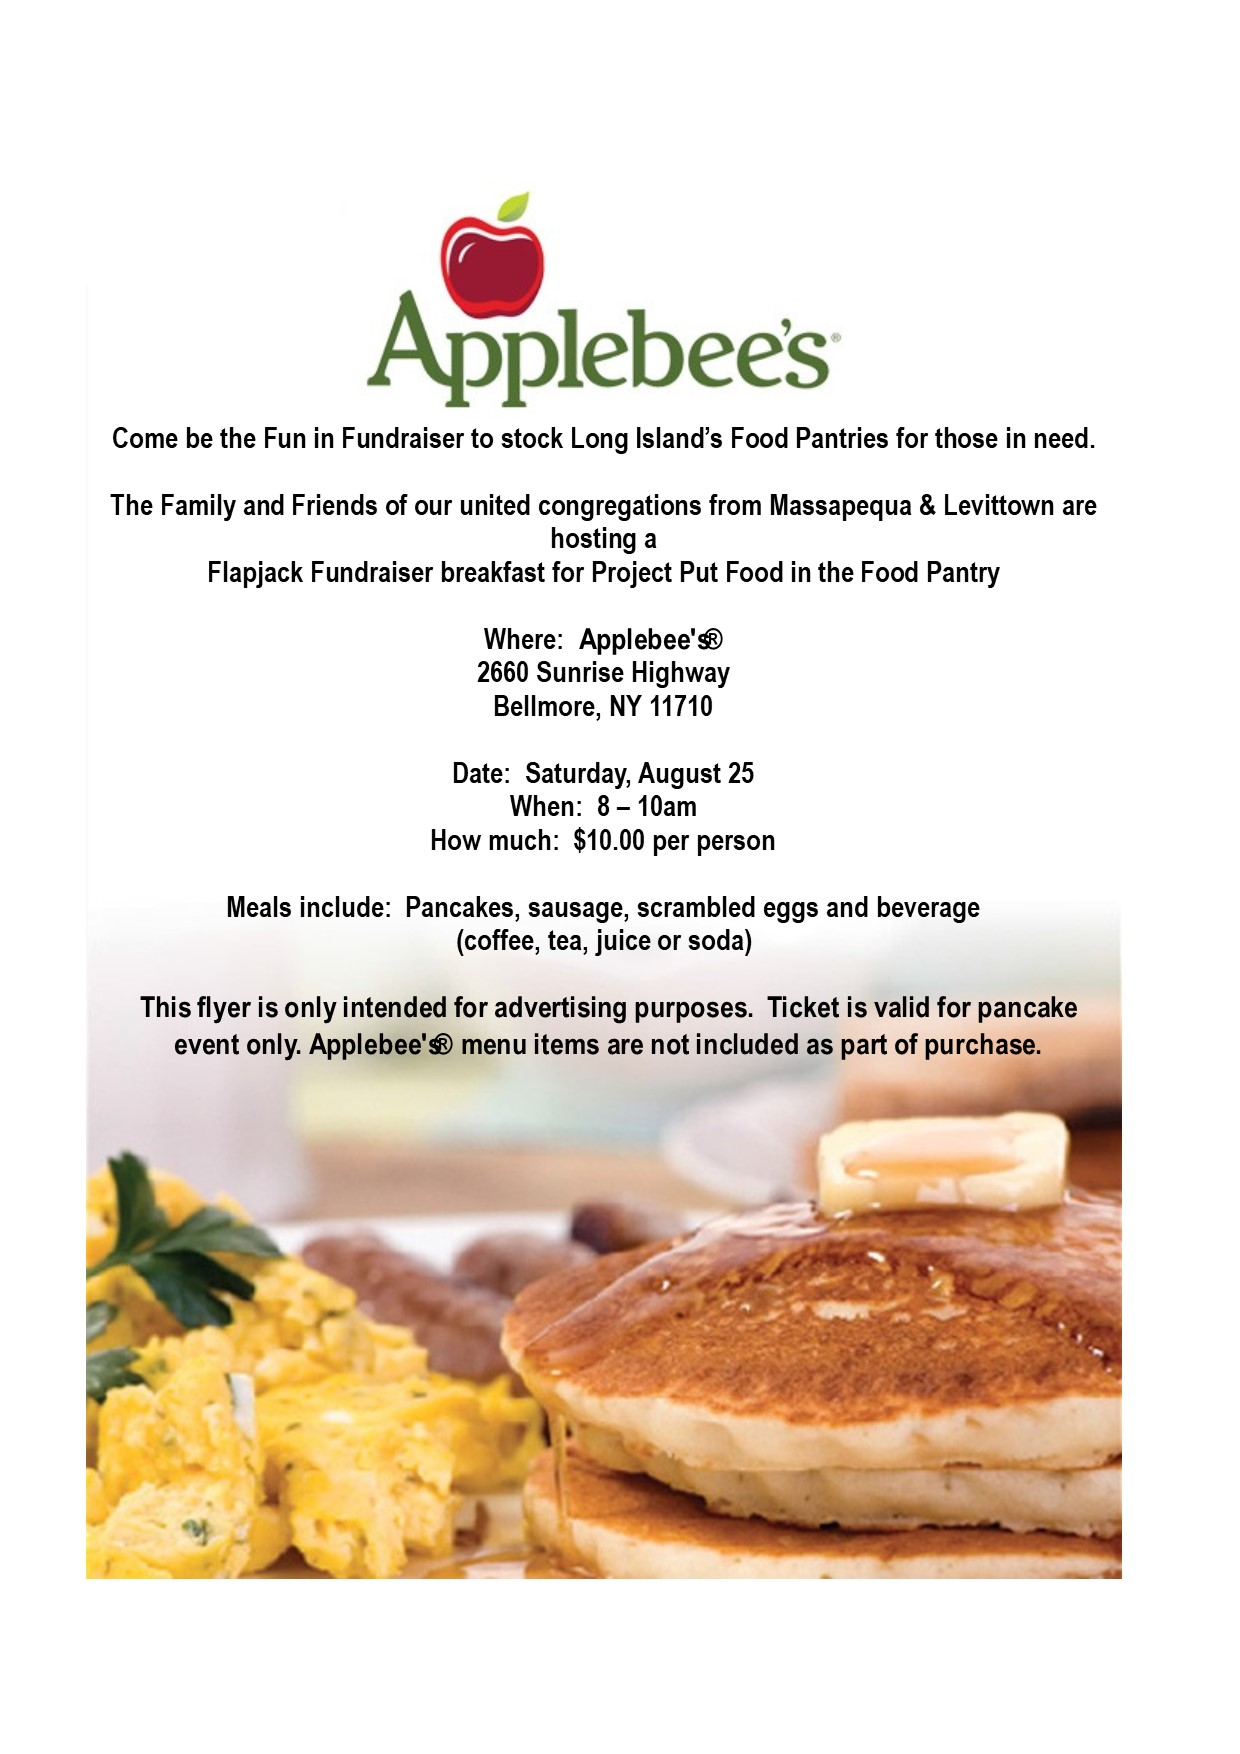 Applebees fundraiser 8-25